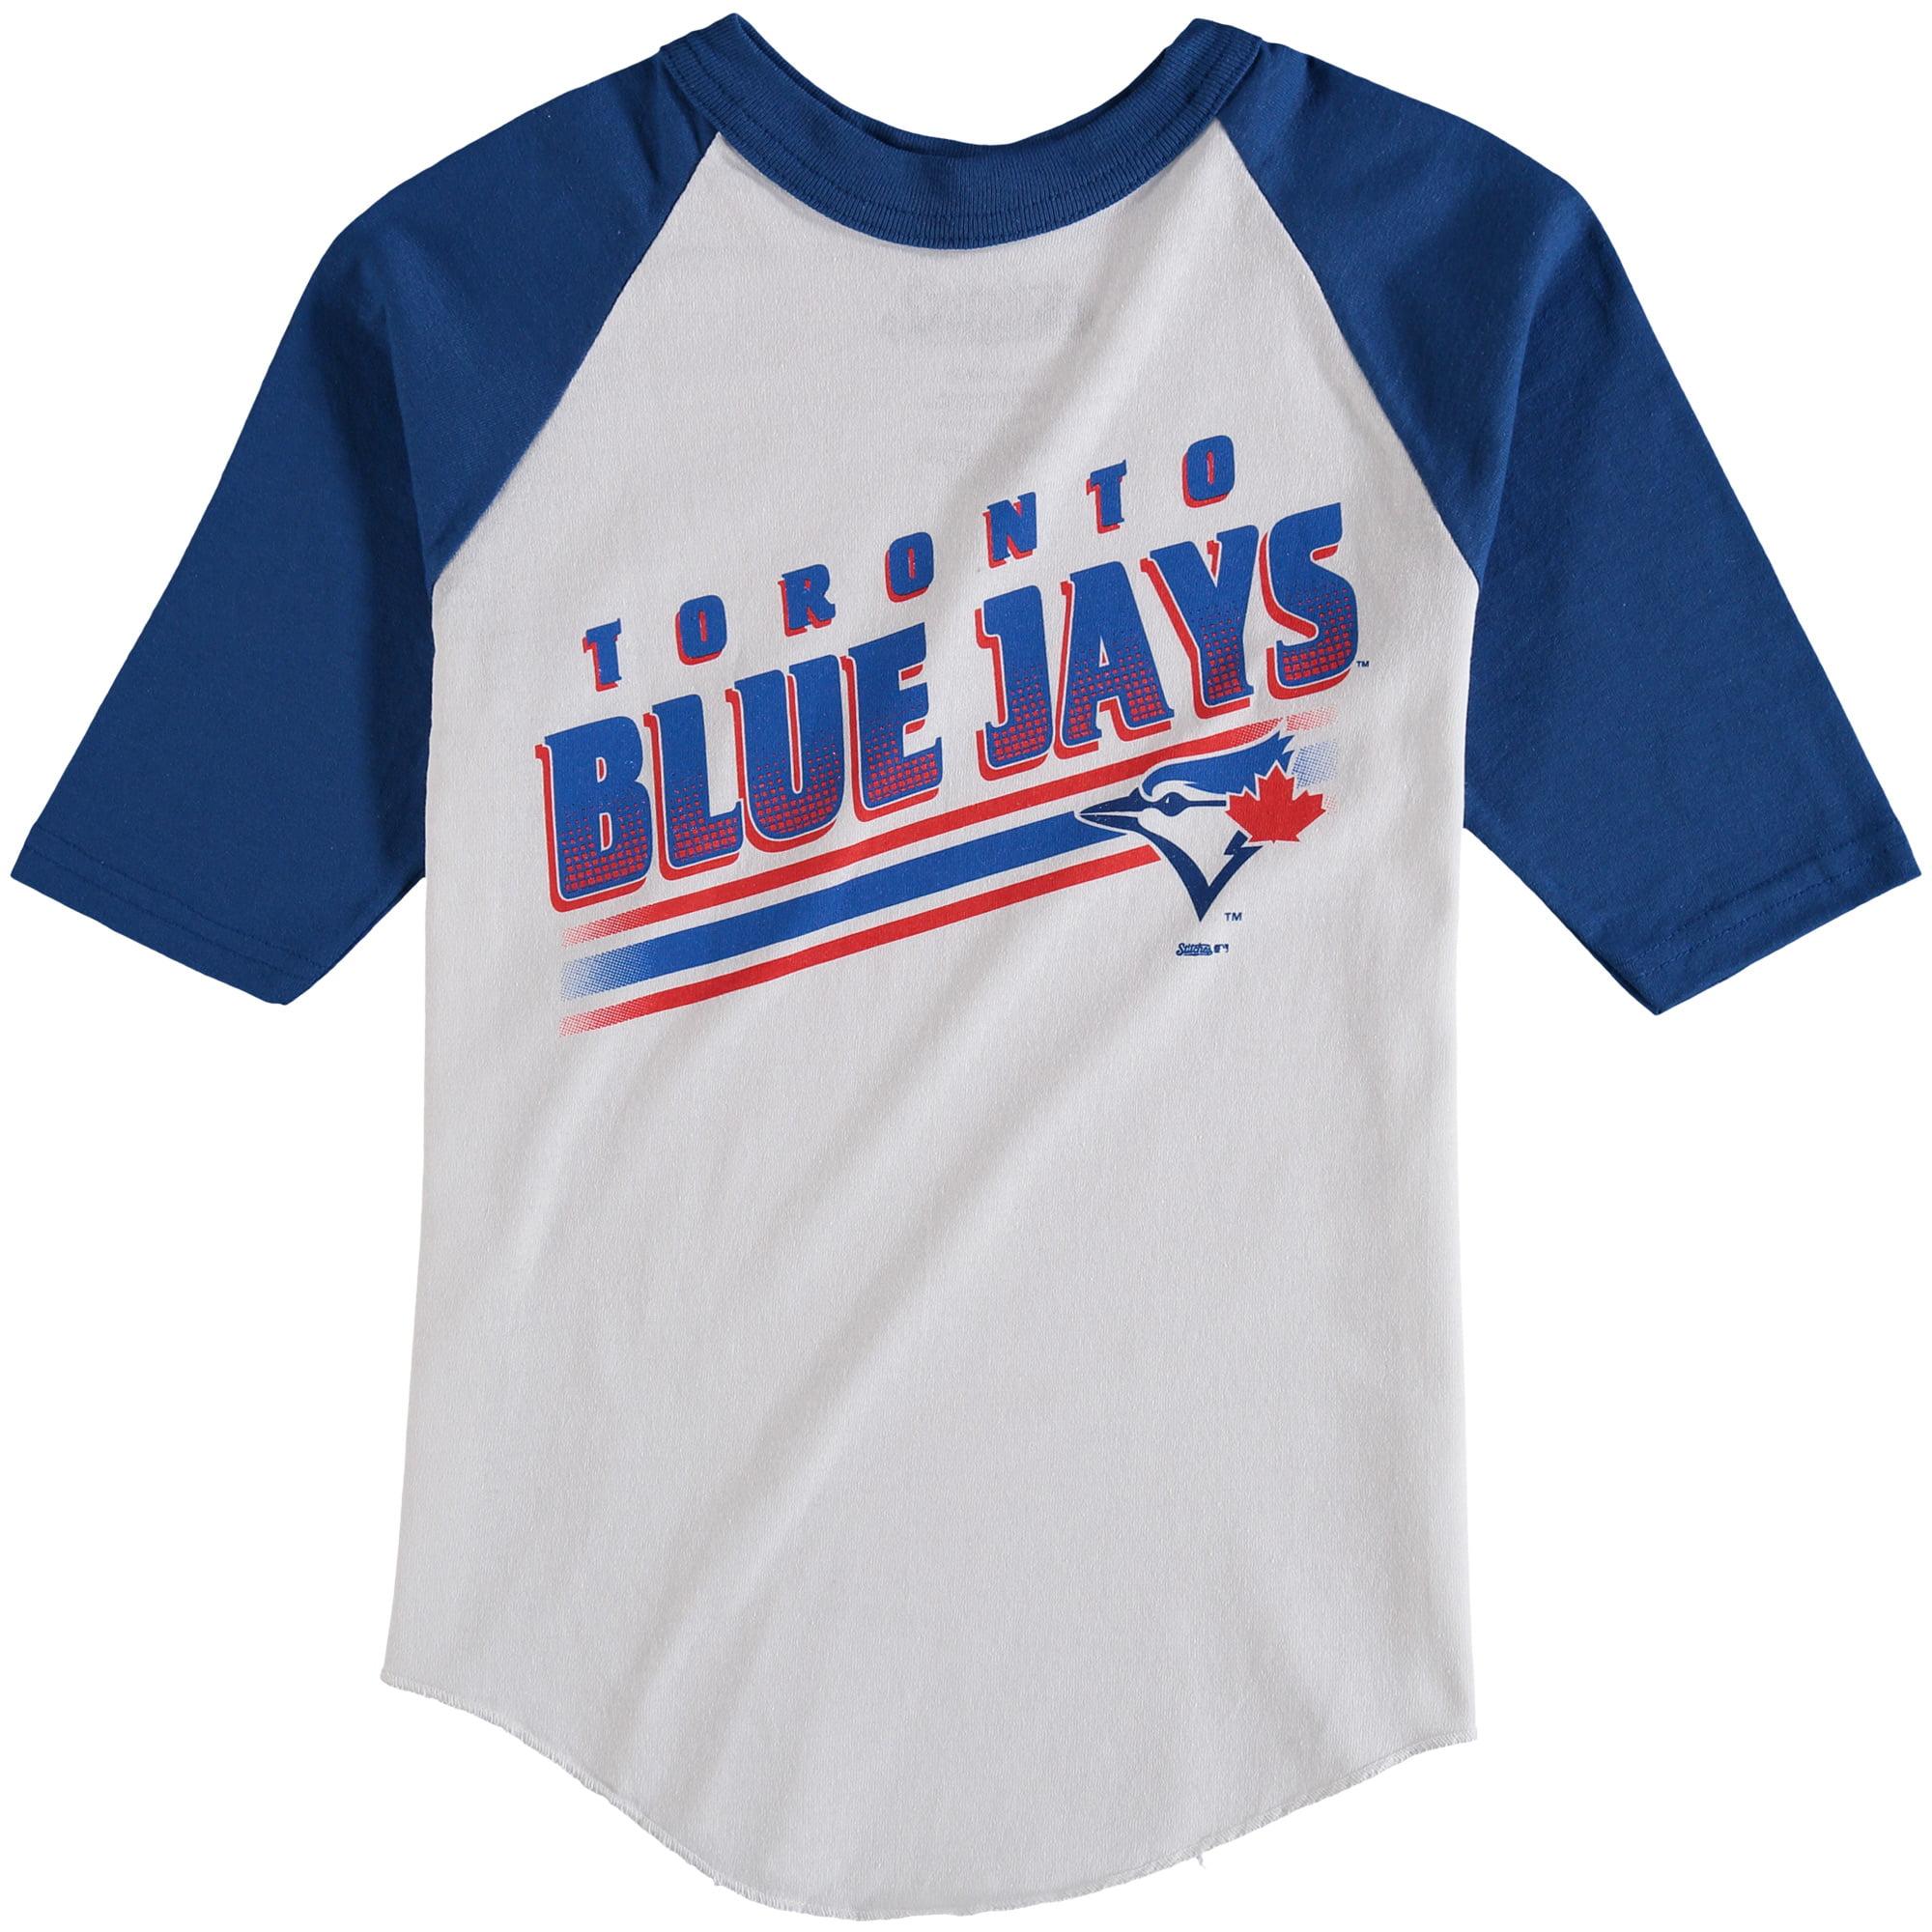 Toronto Blue Jays Stitches Youth 3/4-Sleeve Raglan T-Shirt - White/Royal